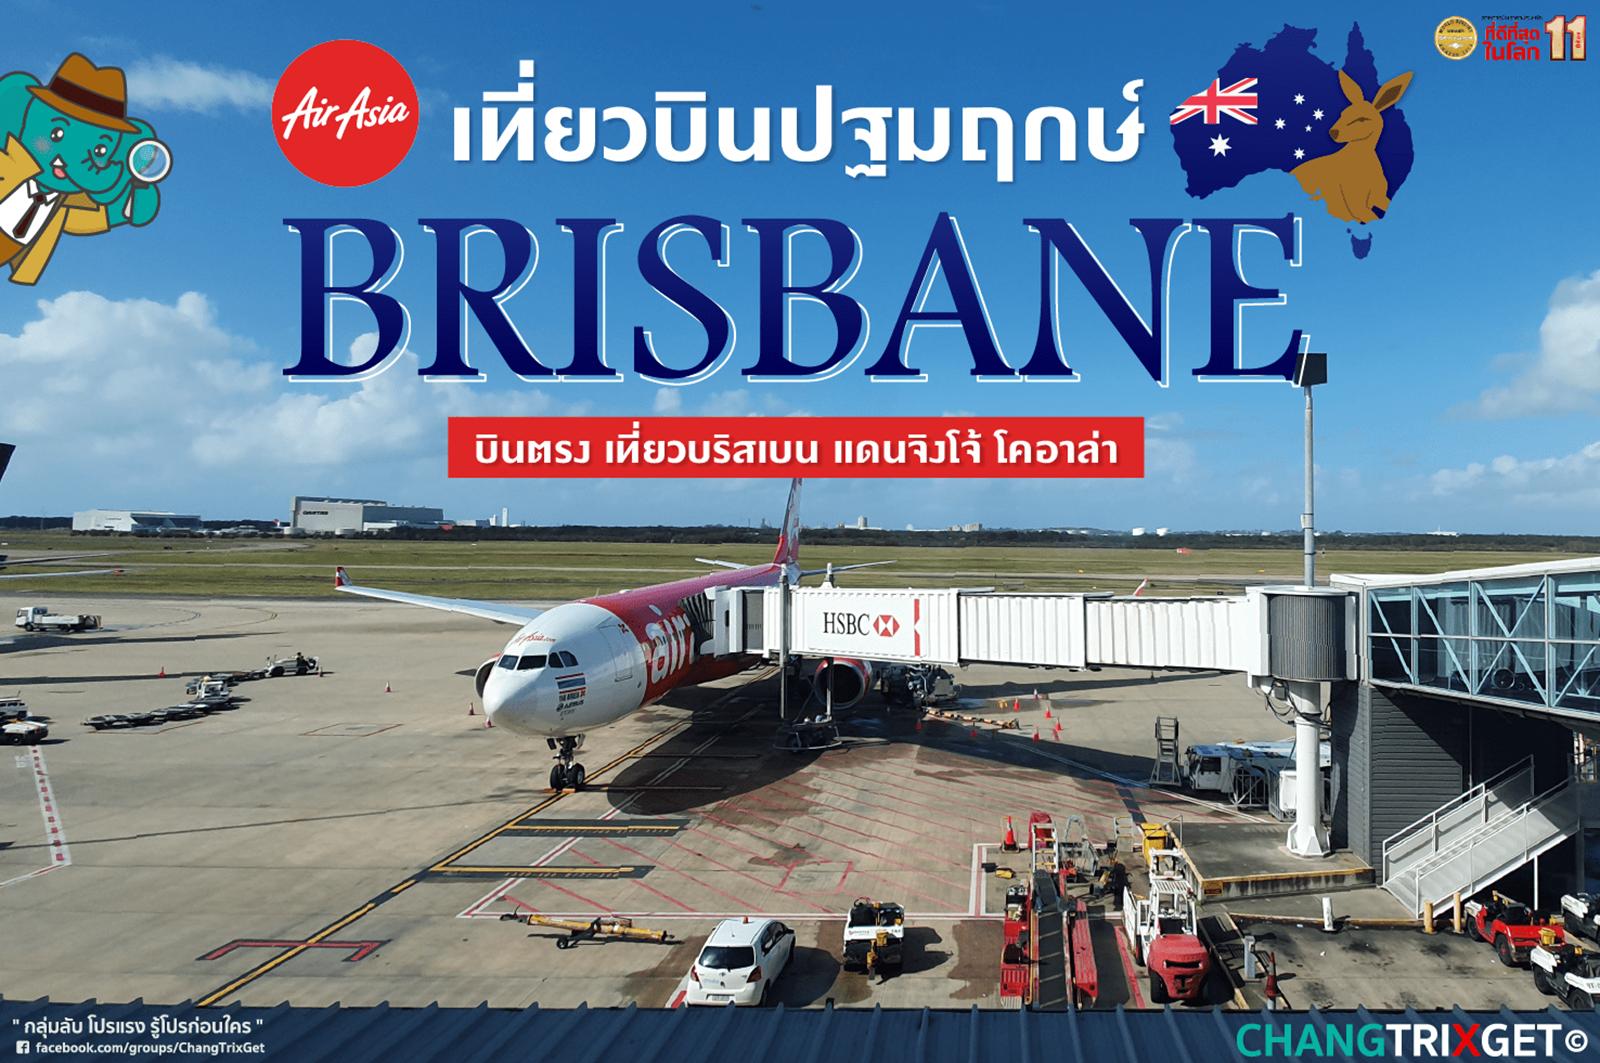 brisbane-thai-airasia-x-first-flight